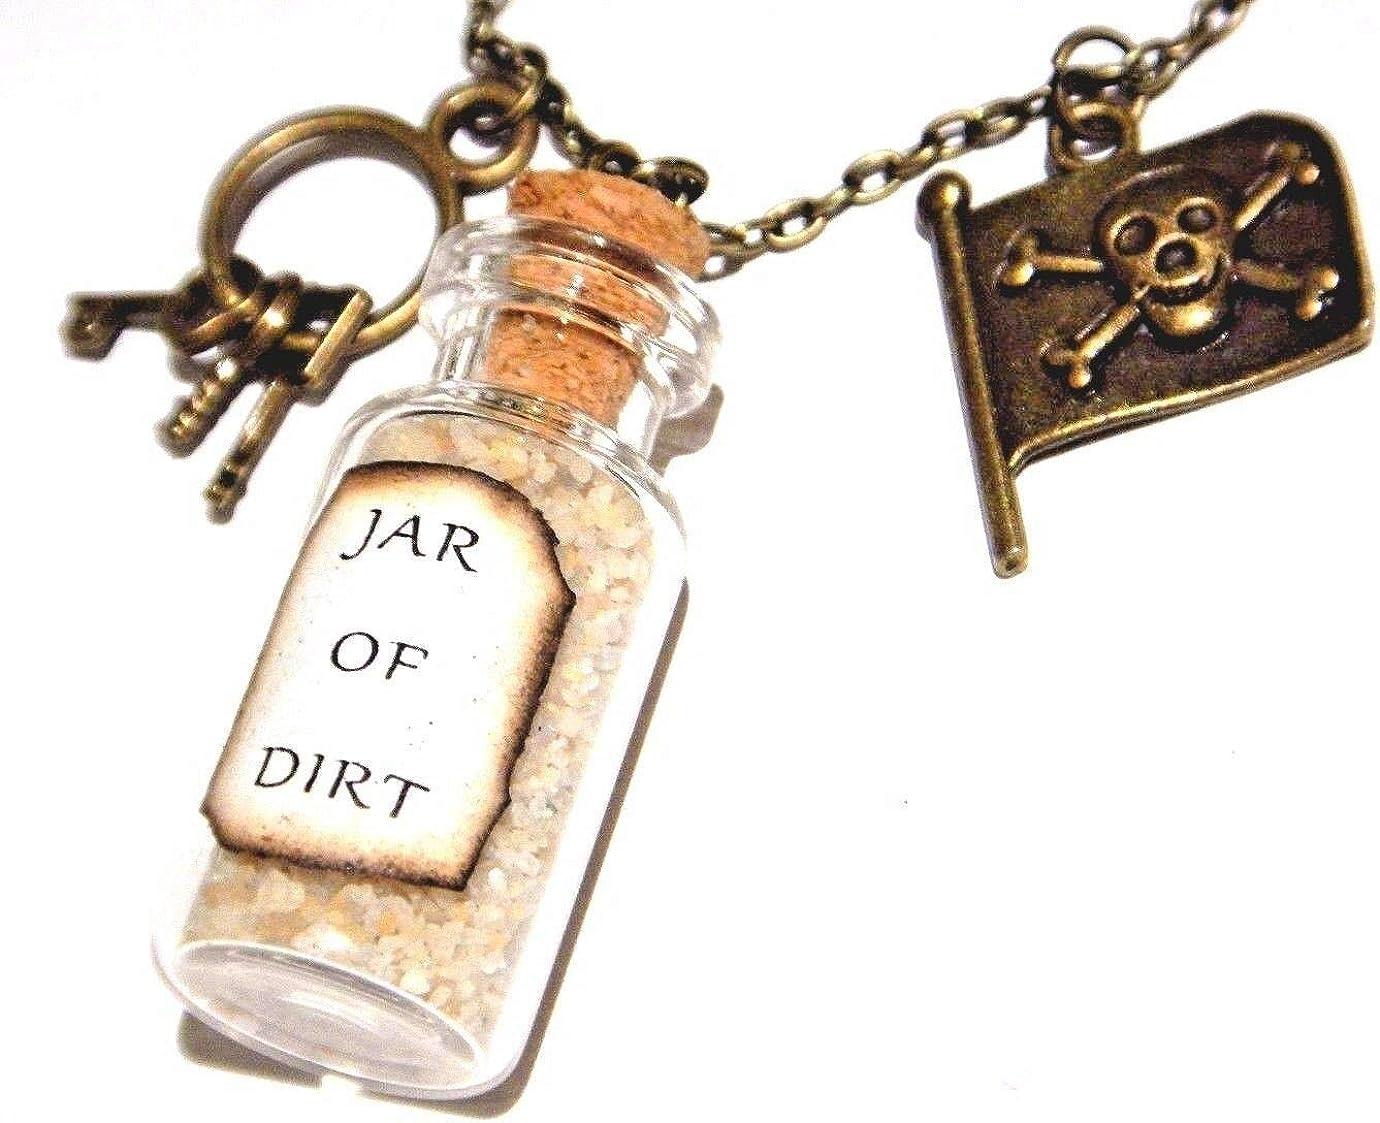 Low Philadelphia Mall price Bronze Pirate Charm Necklace jar of Roger Jolly Dirt Keys Skull